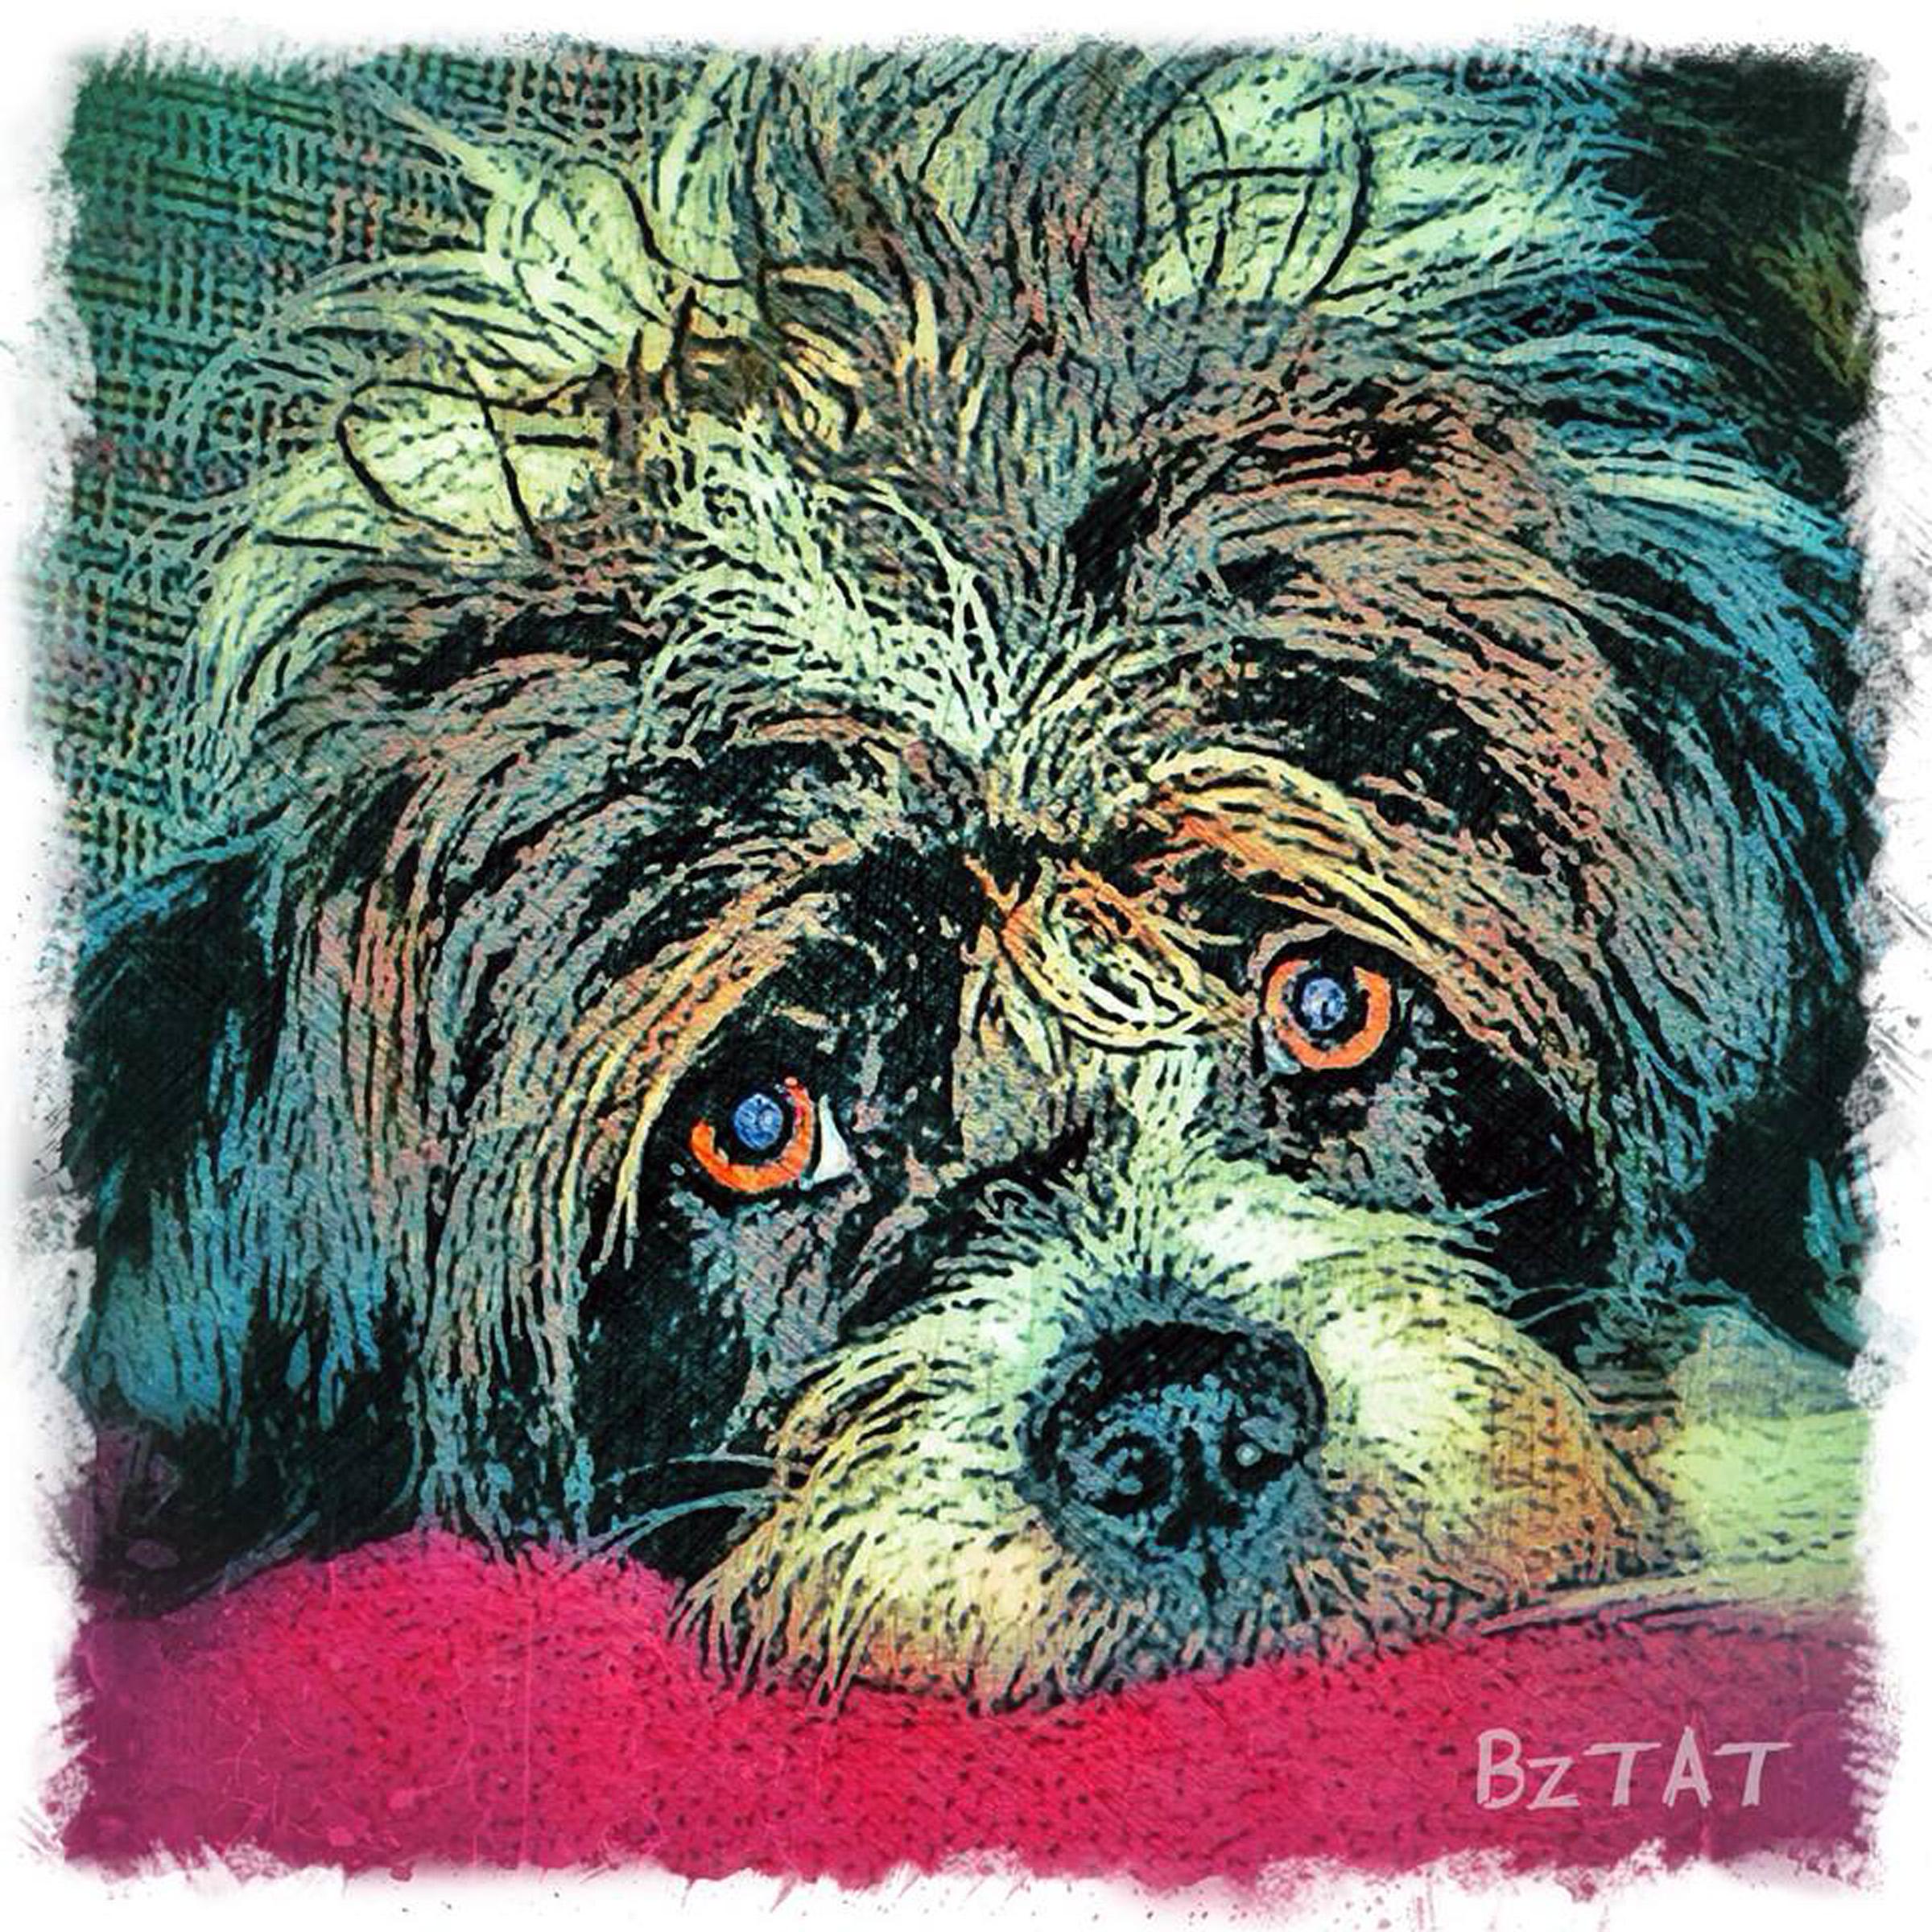 2-Digital-pet-portrait-dog-art-calendar-BZTAT